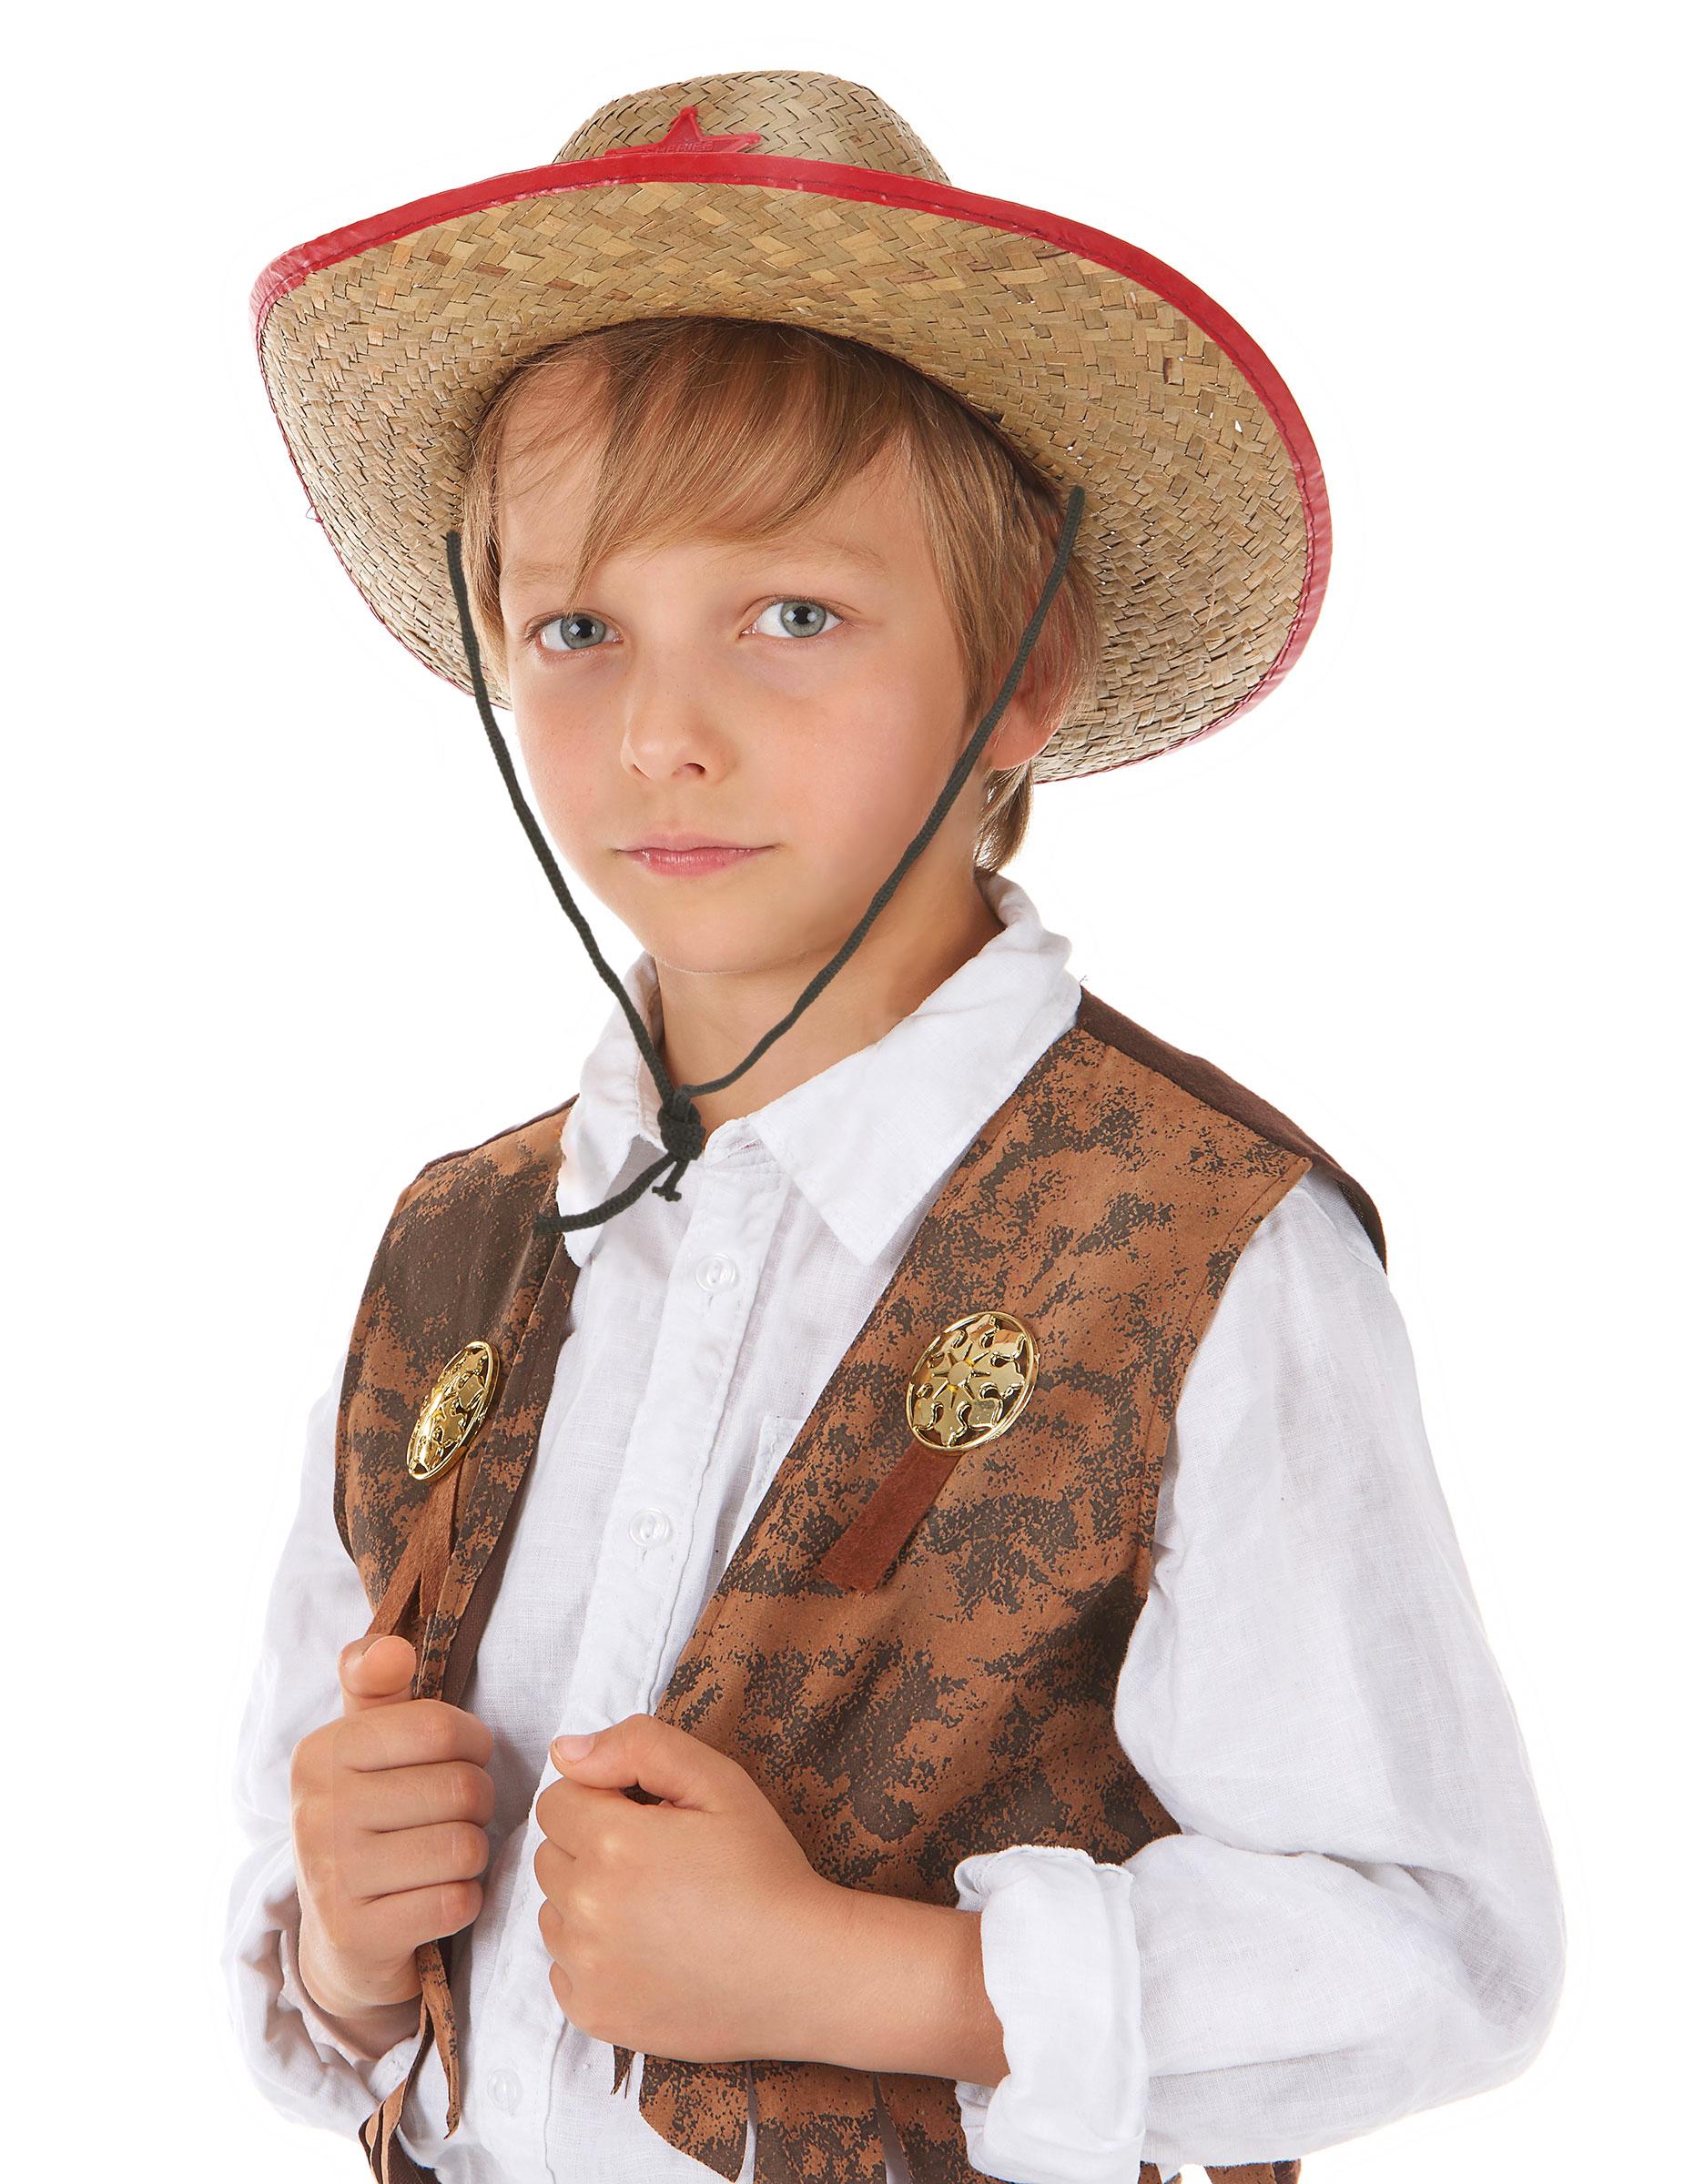 3496e3f0ce47a Sombrero cowboy del oeste paja niño  Sombreros